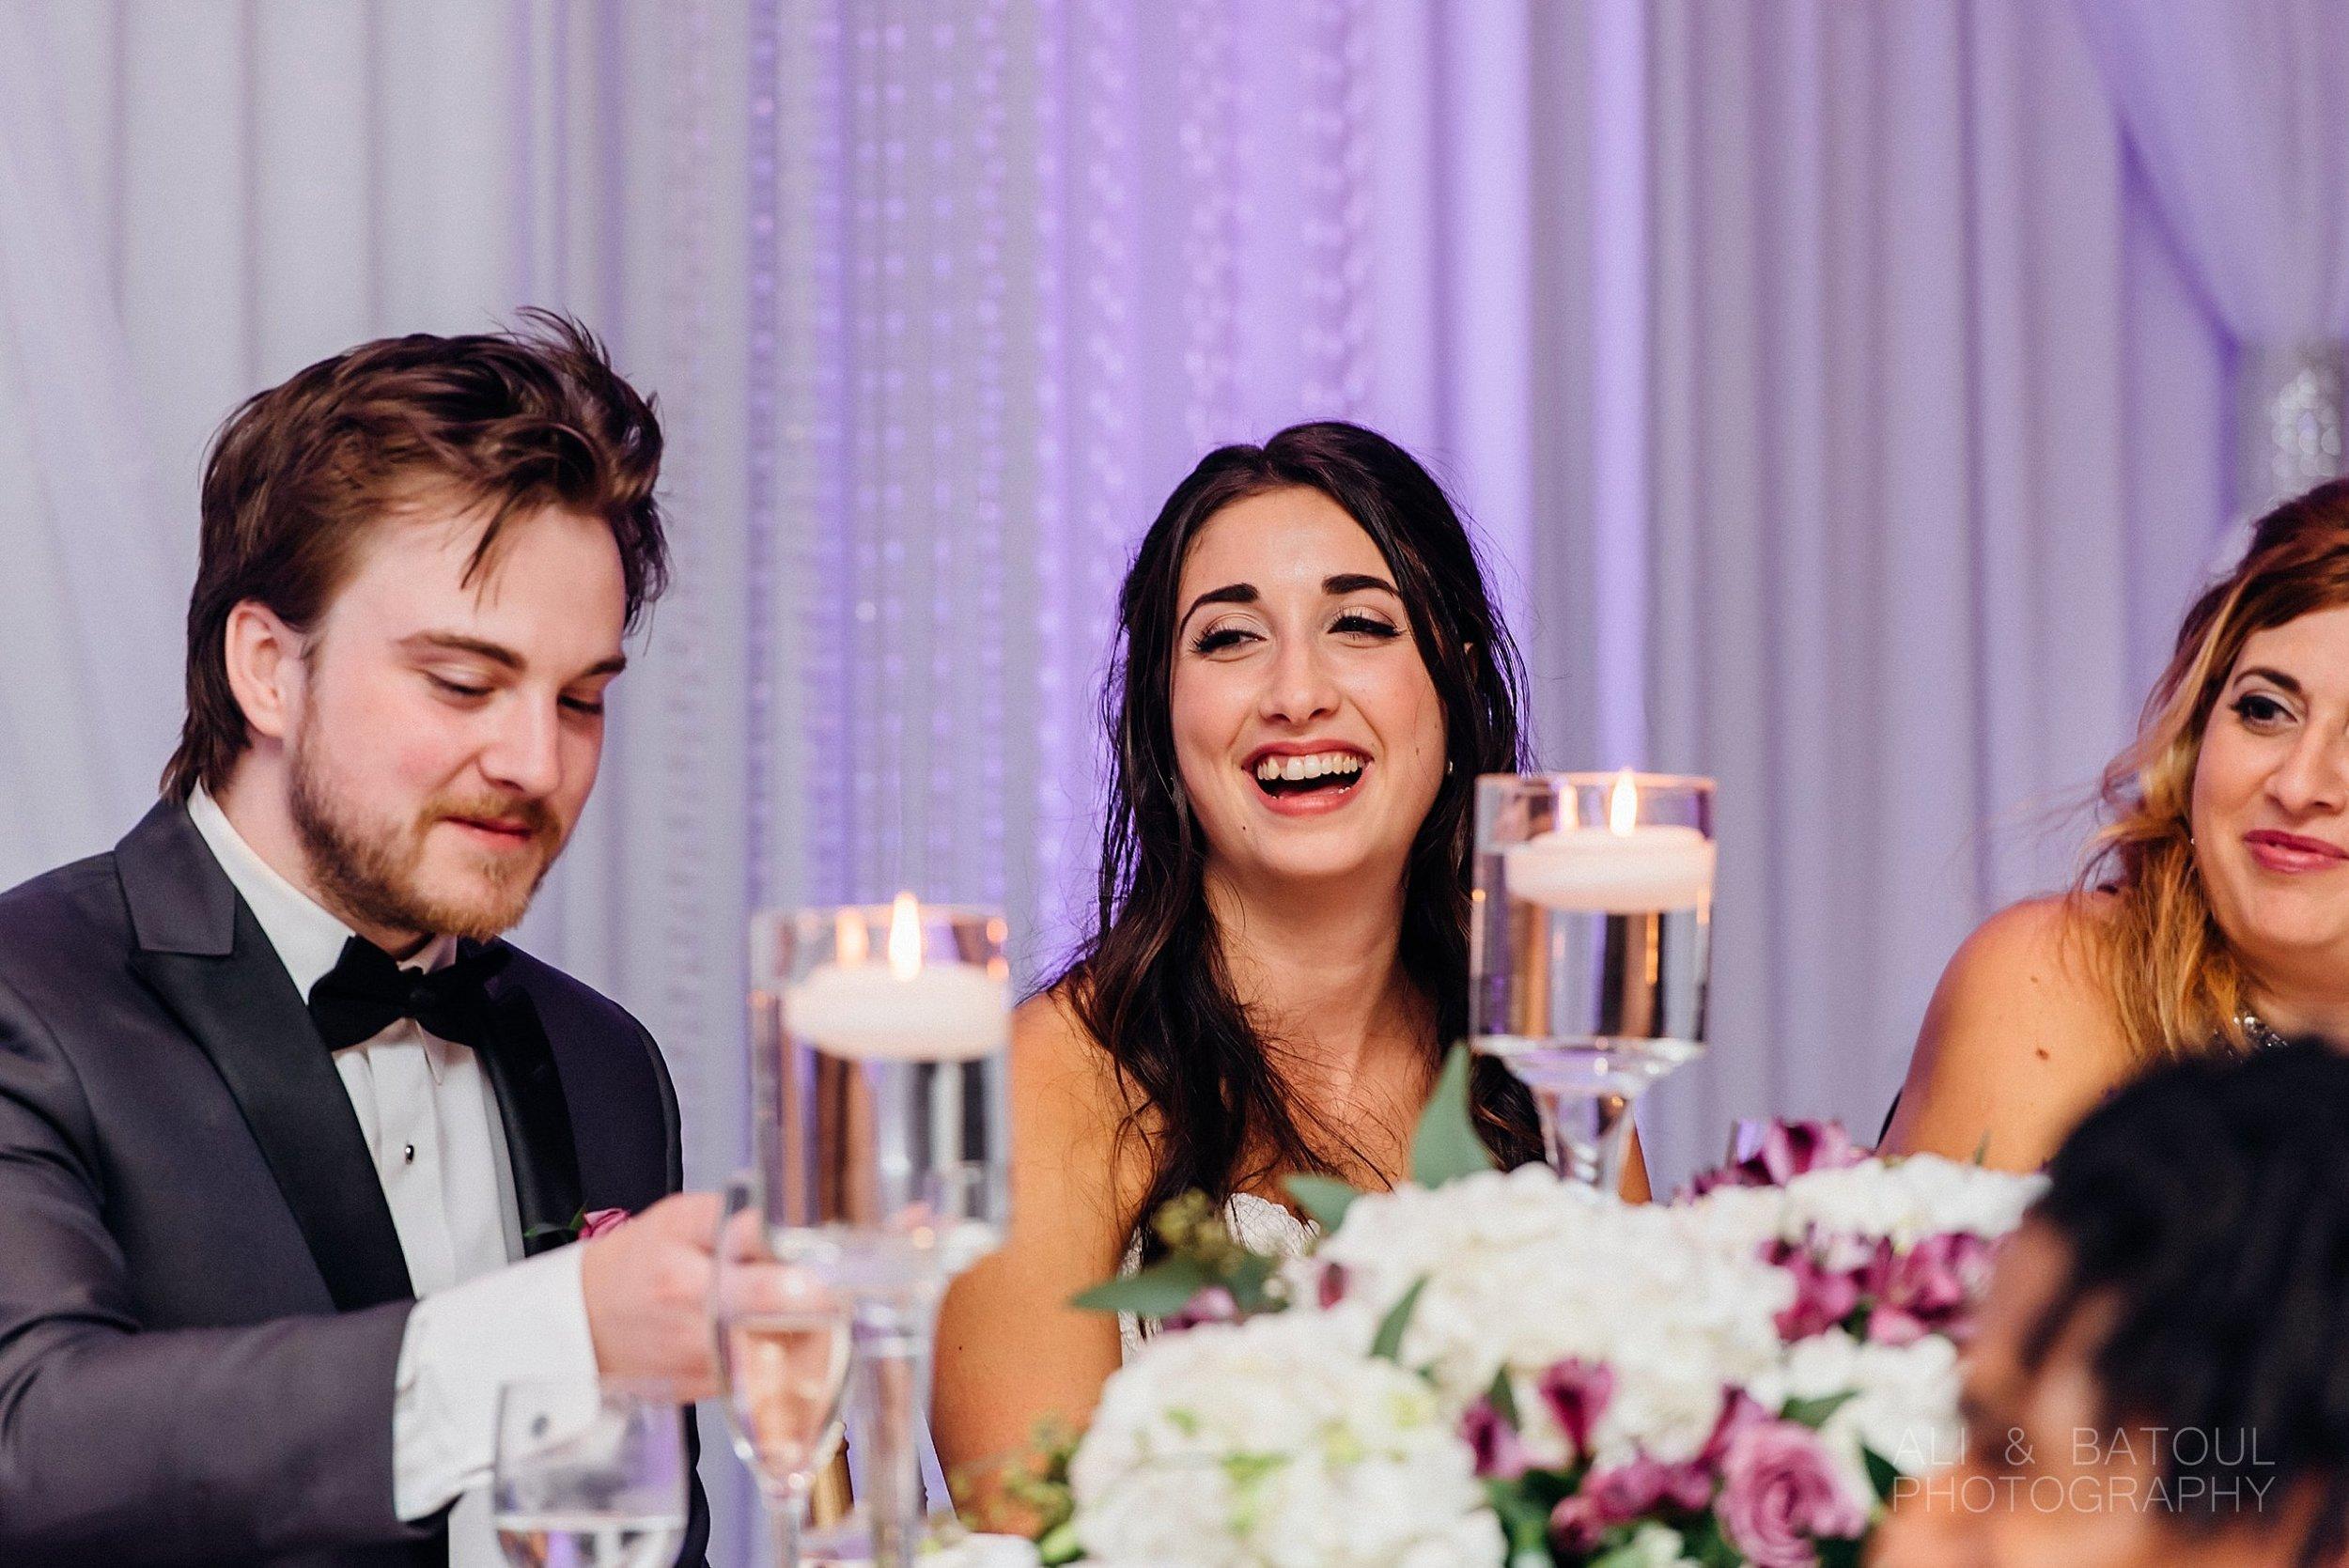 Ali and Batoul Photography - light, airy, indie documentary Ottawa wedding photographer_0075.jpg